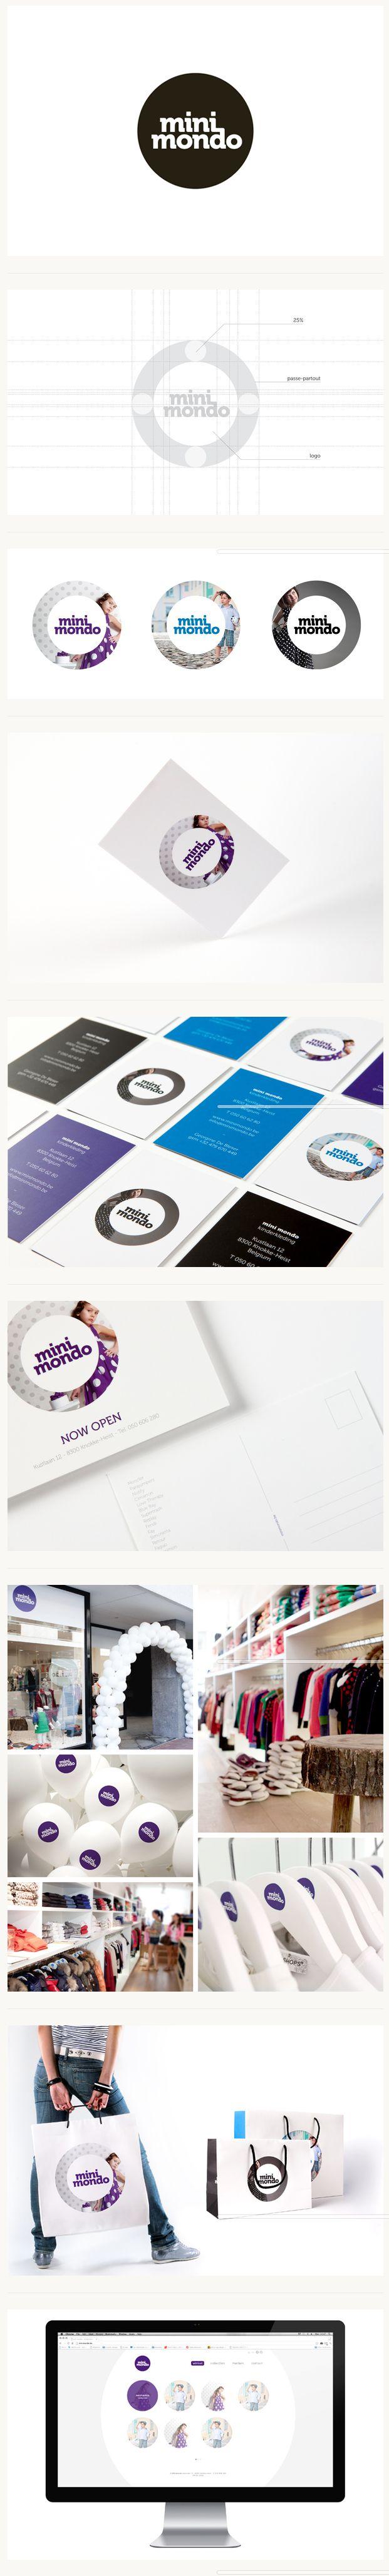 Mini mondo #identity #packaging #branding PD